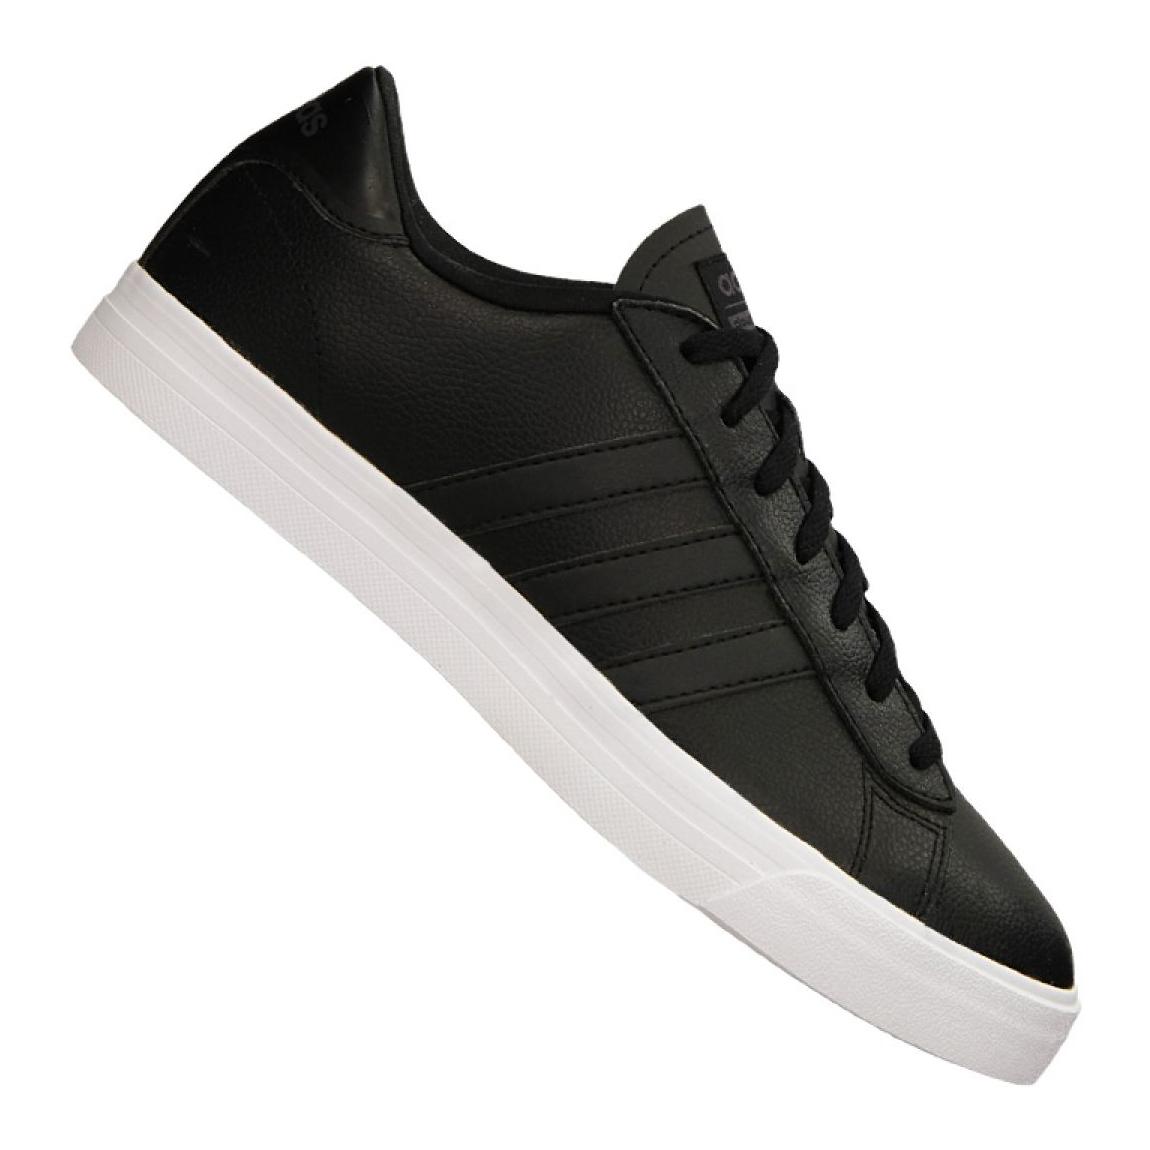 Adidas Cloudfoam Super Daily M B74255 shoes black